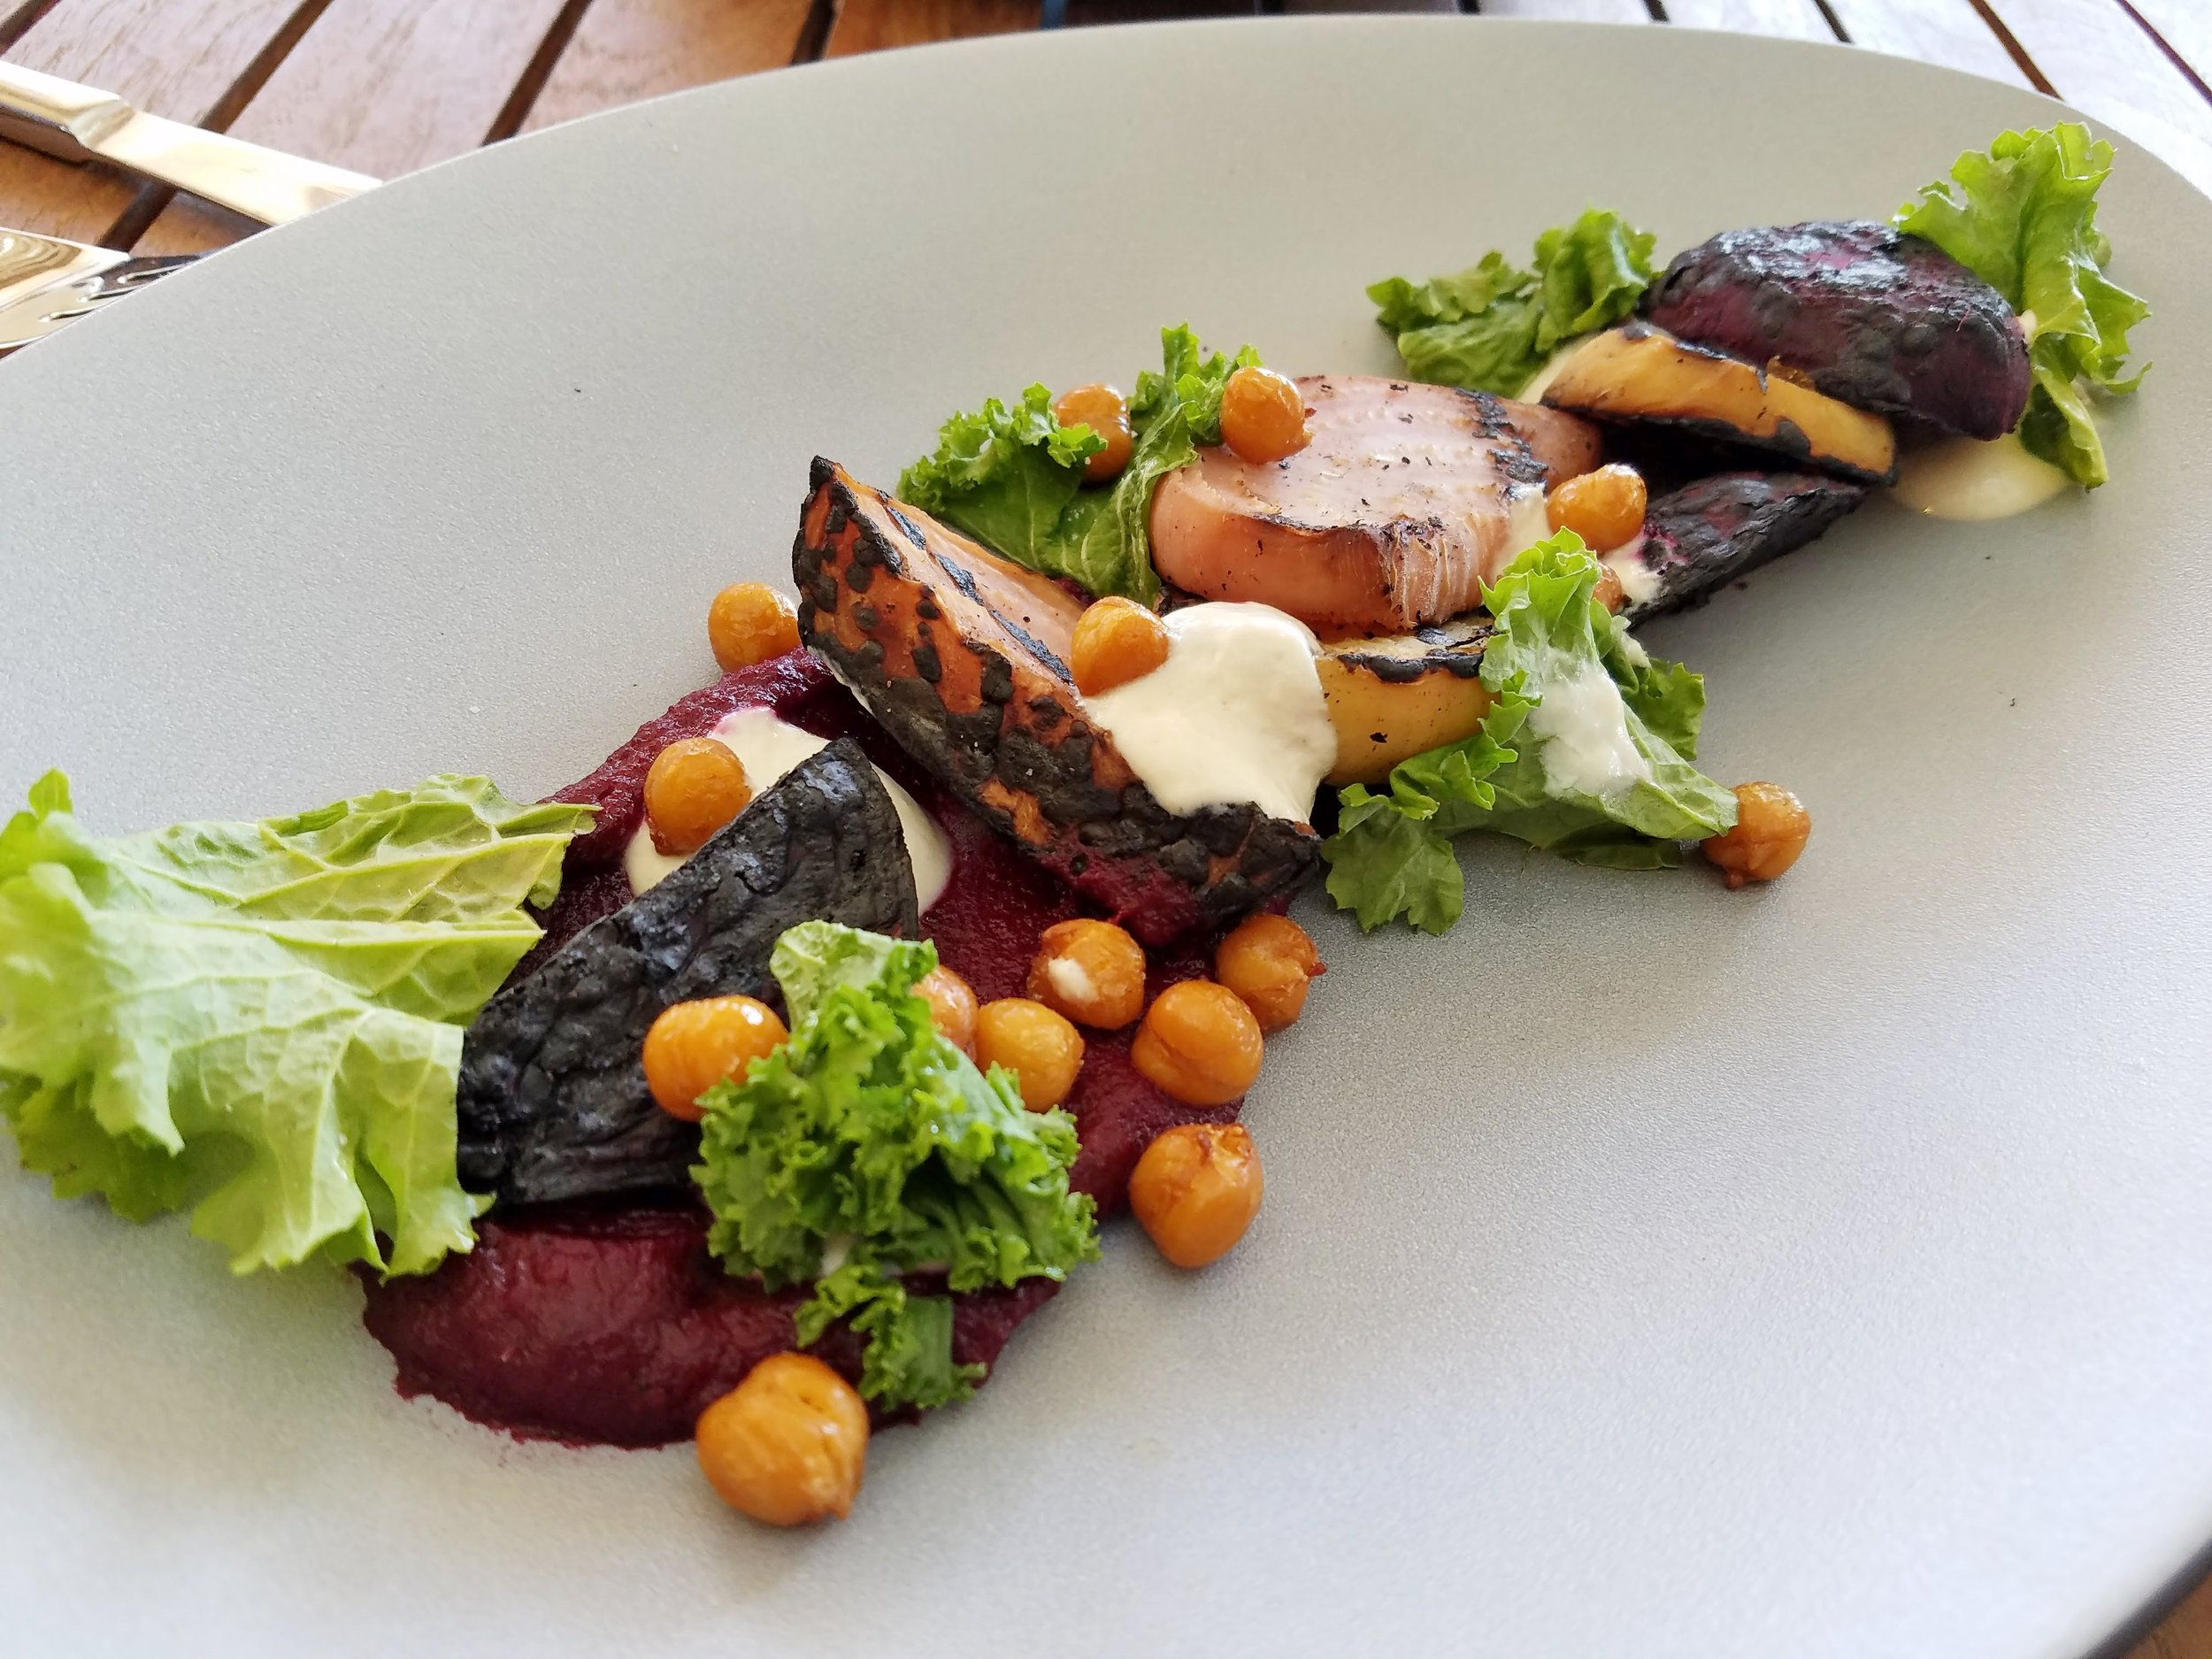 BBQ beets with mustard greens, chickpeas, smoked onion yogurt